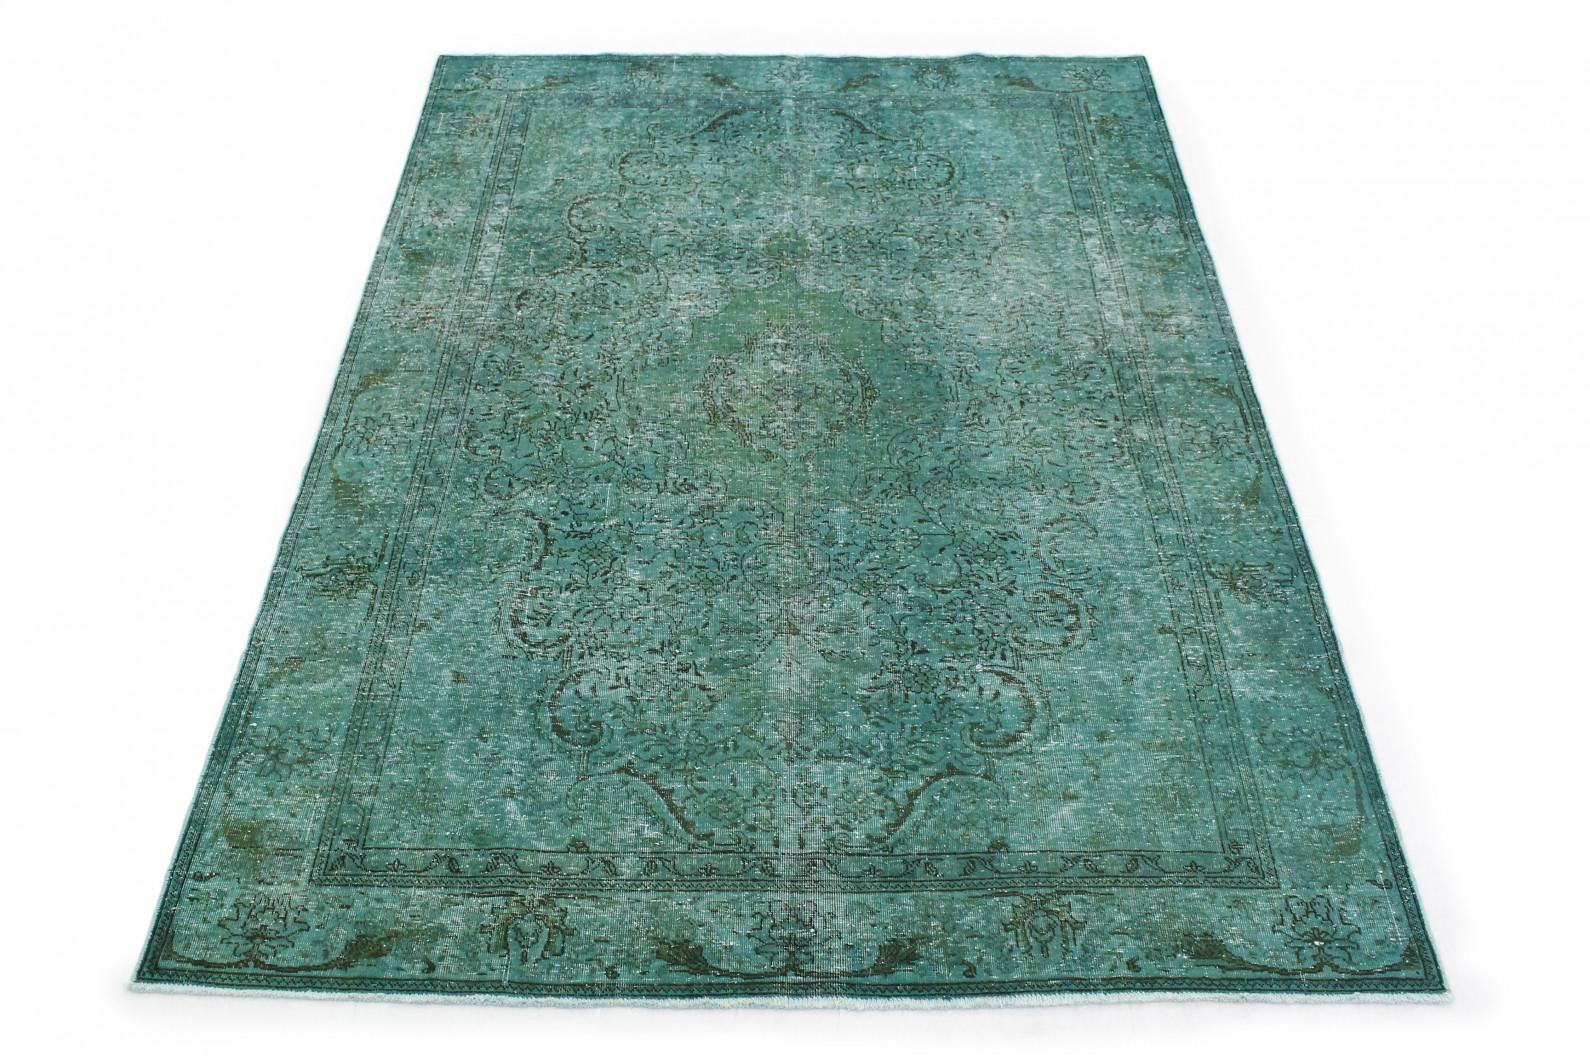 vintage teppich t rkis in 290x200 1001 167240 bei kaufen. Black Bedroom Furniture Sets. Home Design Ideas